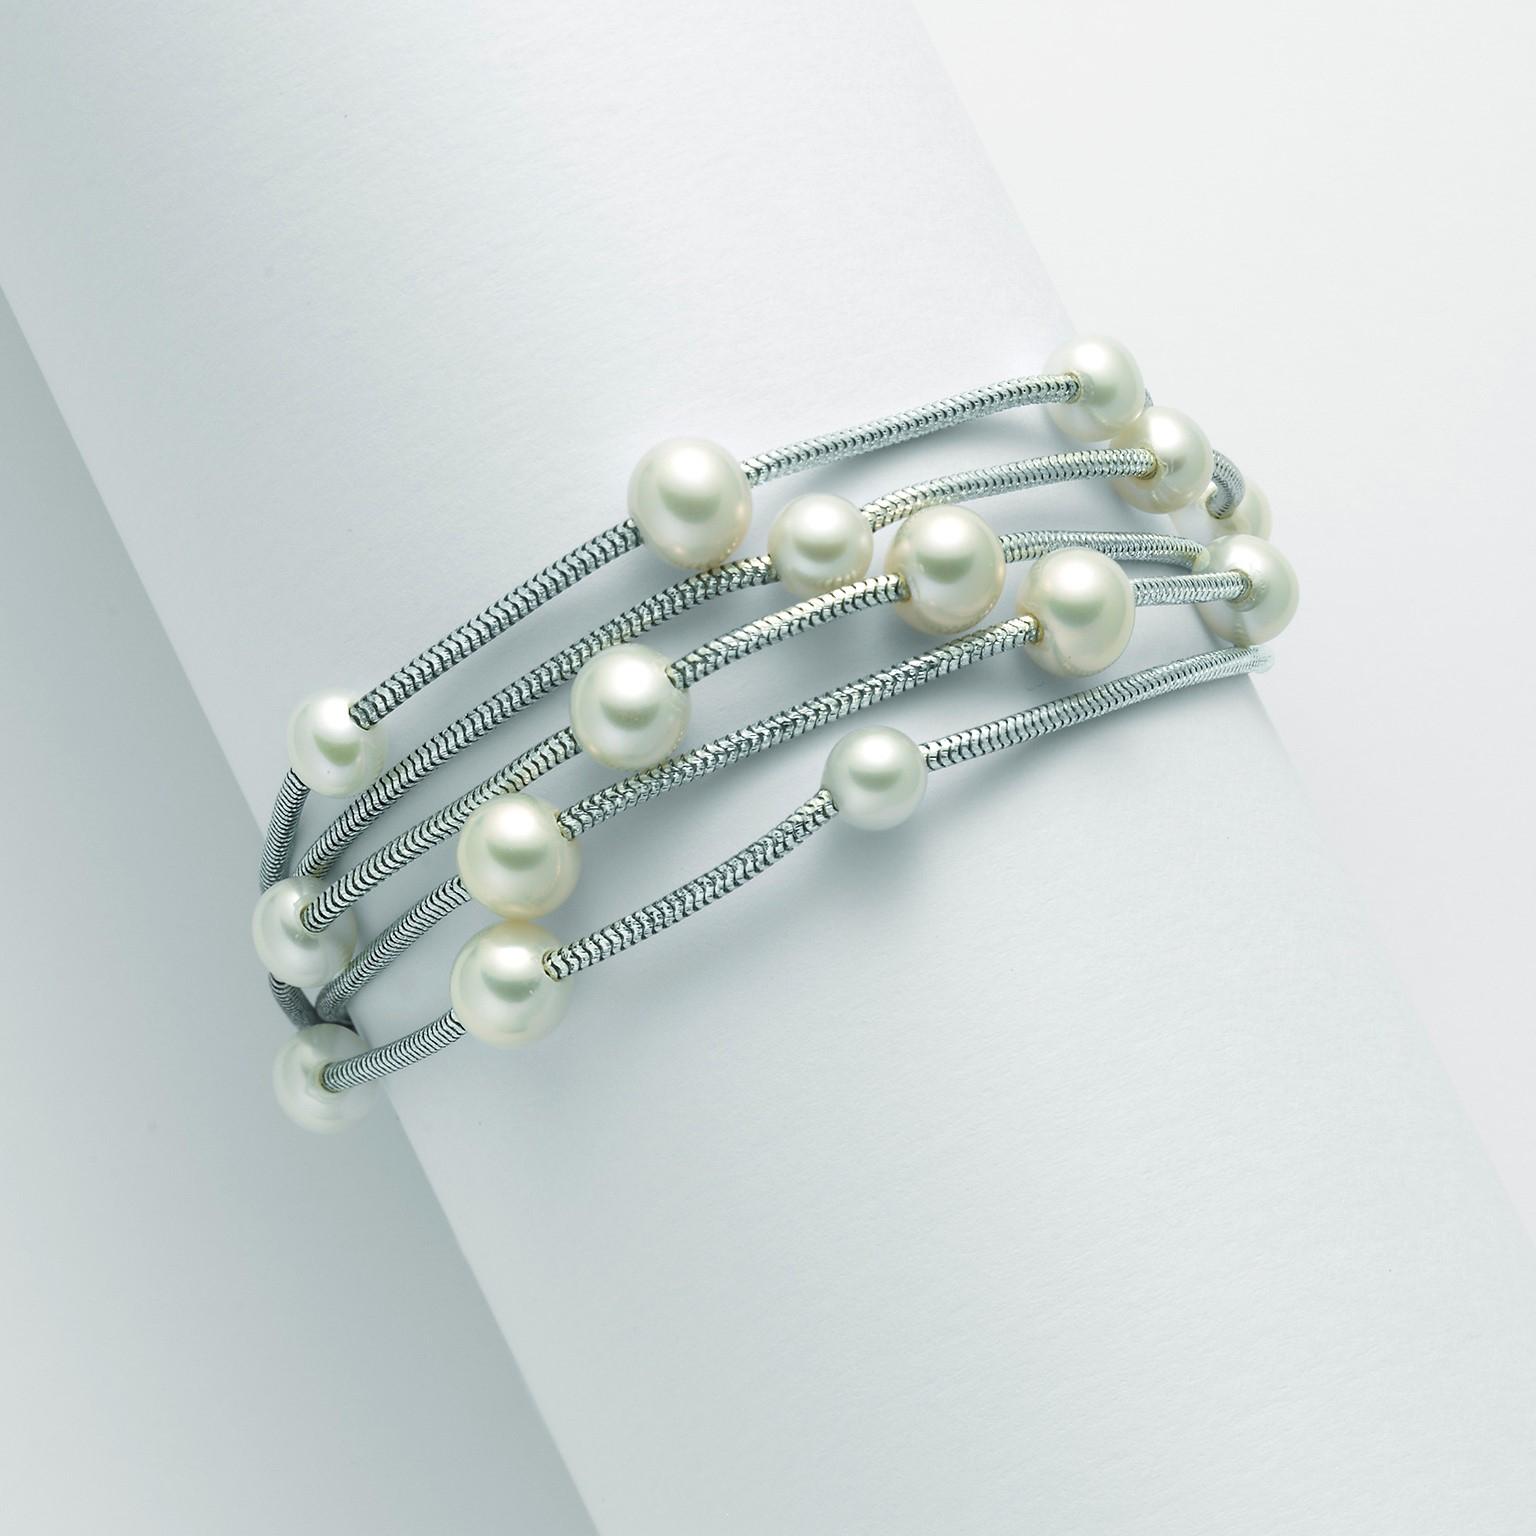 MILUNA-Bracciale in argento con perle